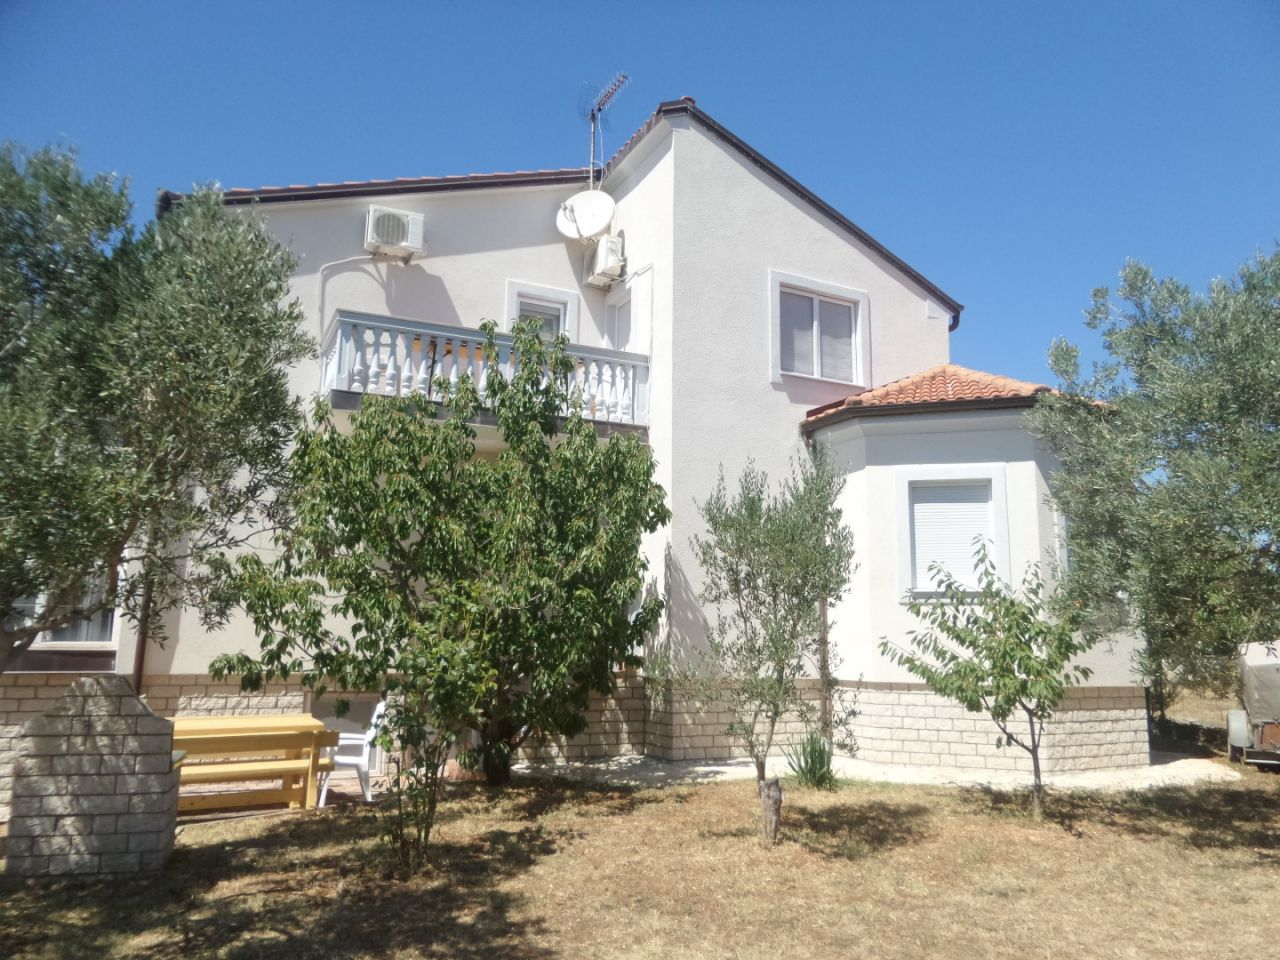 Дом в Фажане, Хорватия, 440 м2 - фото 1